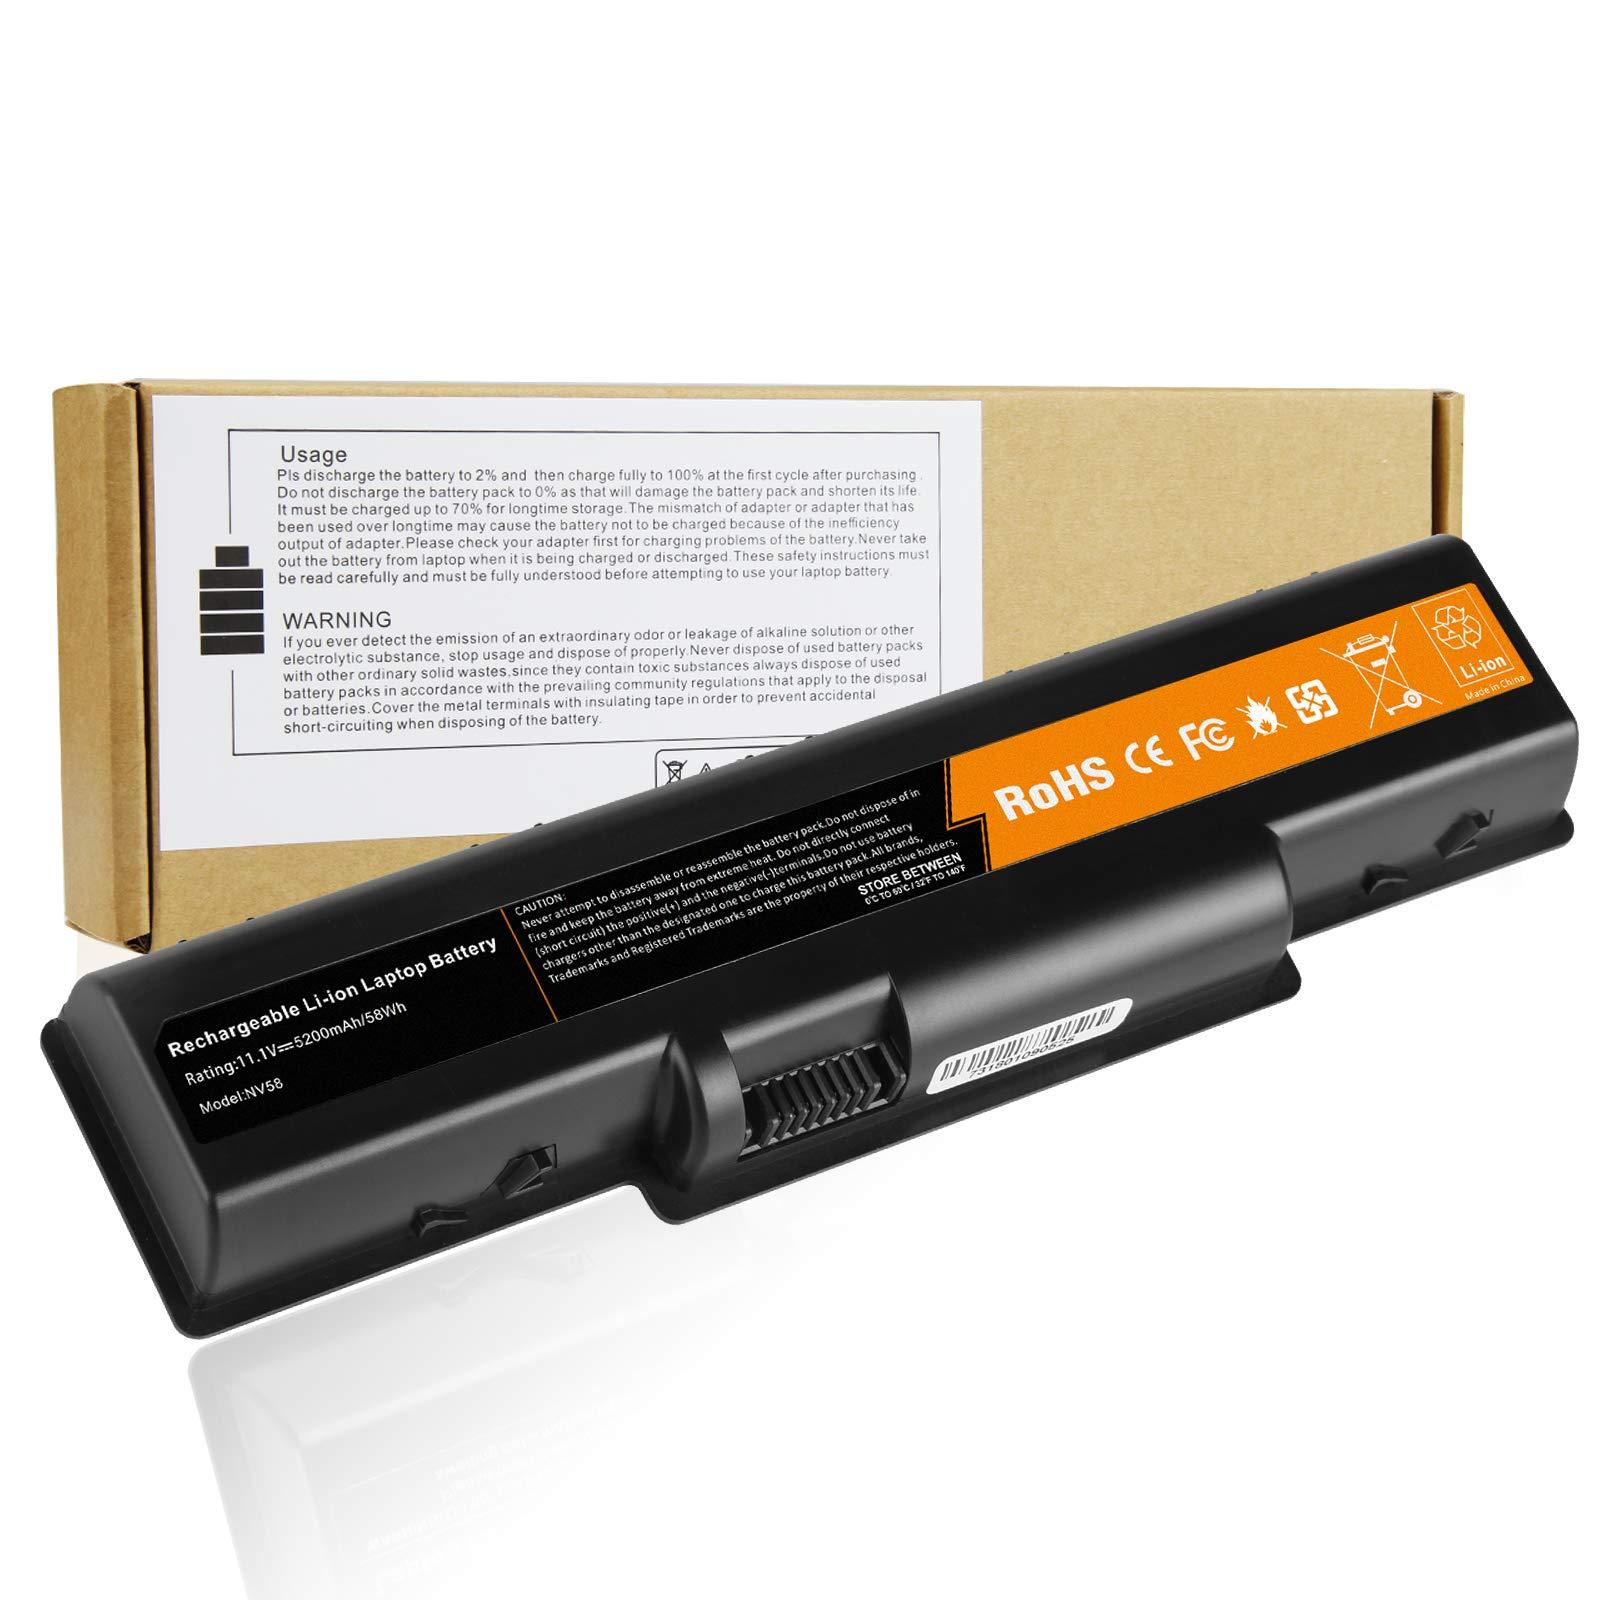 Bateria para Acer Aspire 5532 5732Z 5334 5517 AS09A31 AS09A61 AS09A41 AS09A51 AS09A71 AS09A75-12 6 Celdas 11.1V 5200mAh